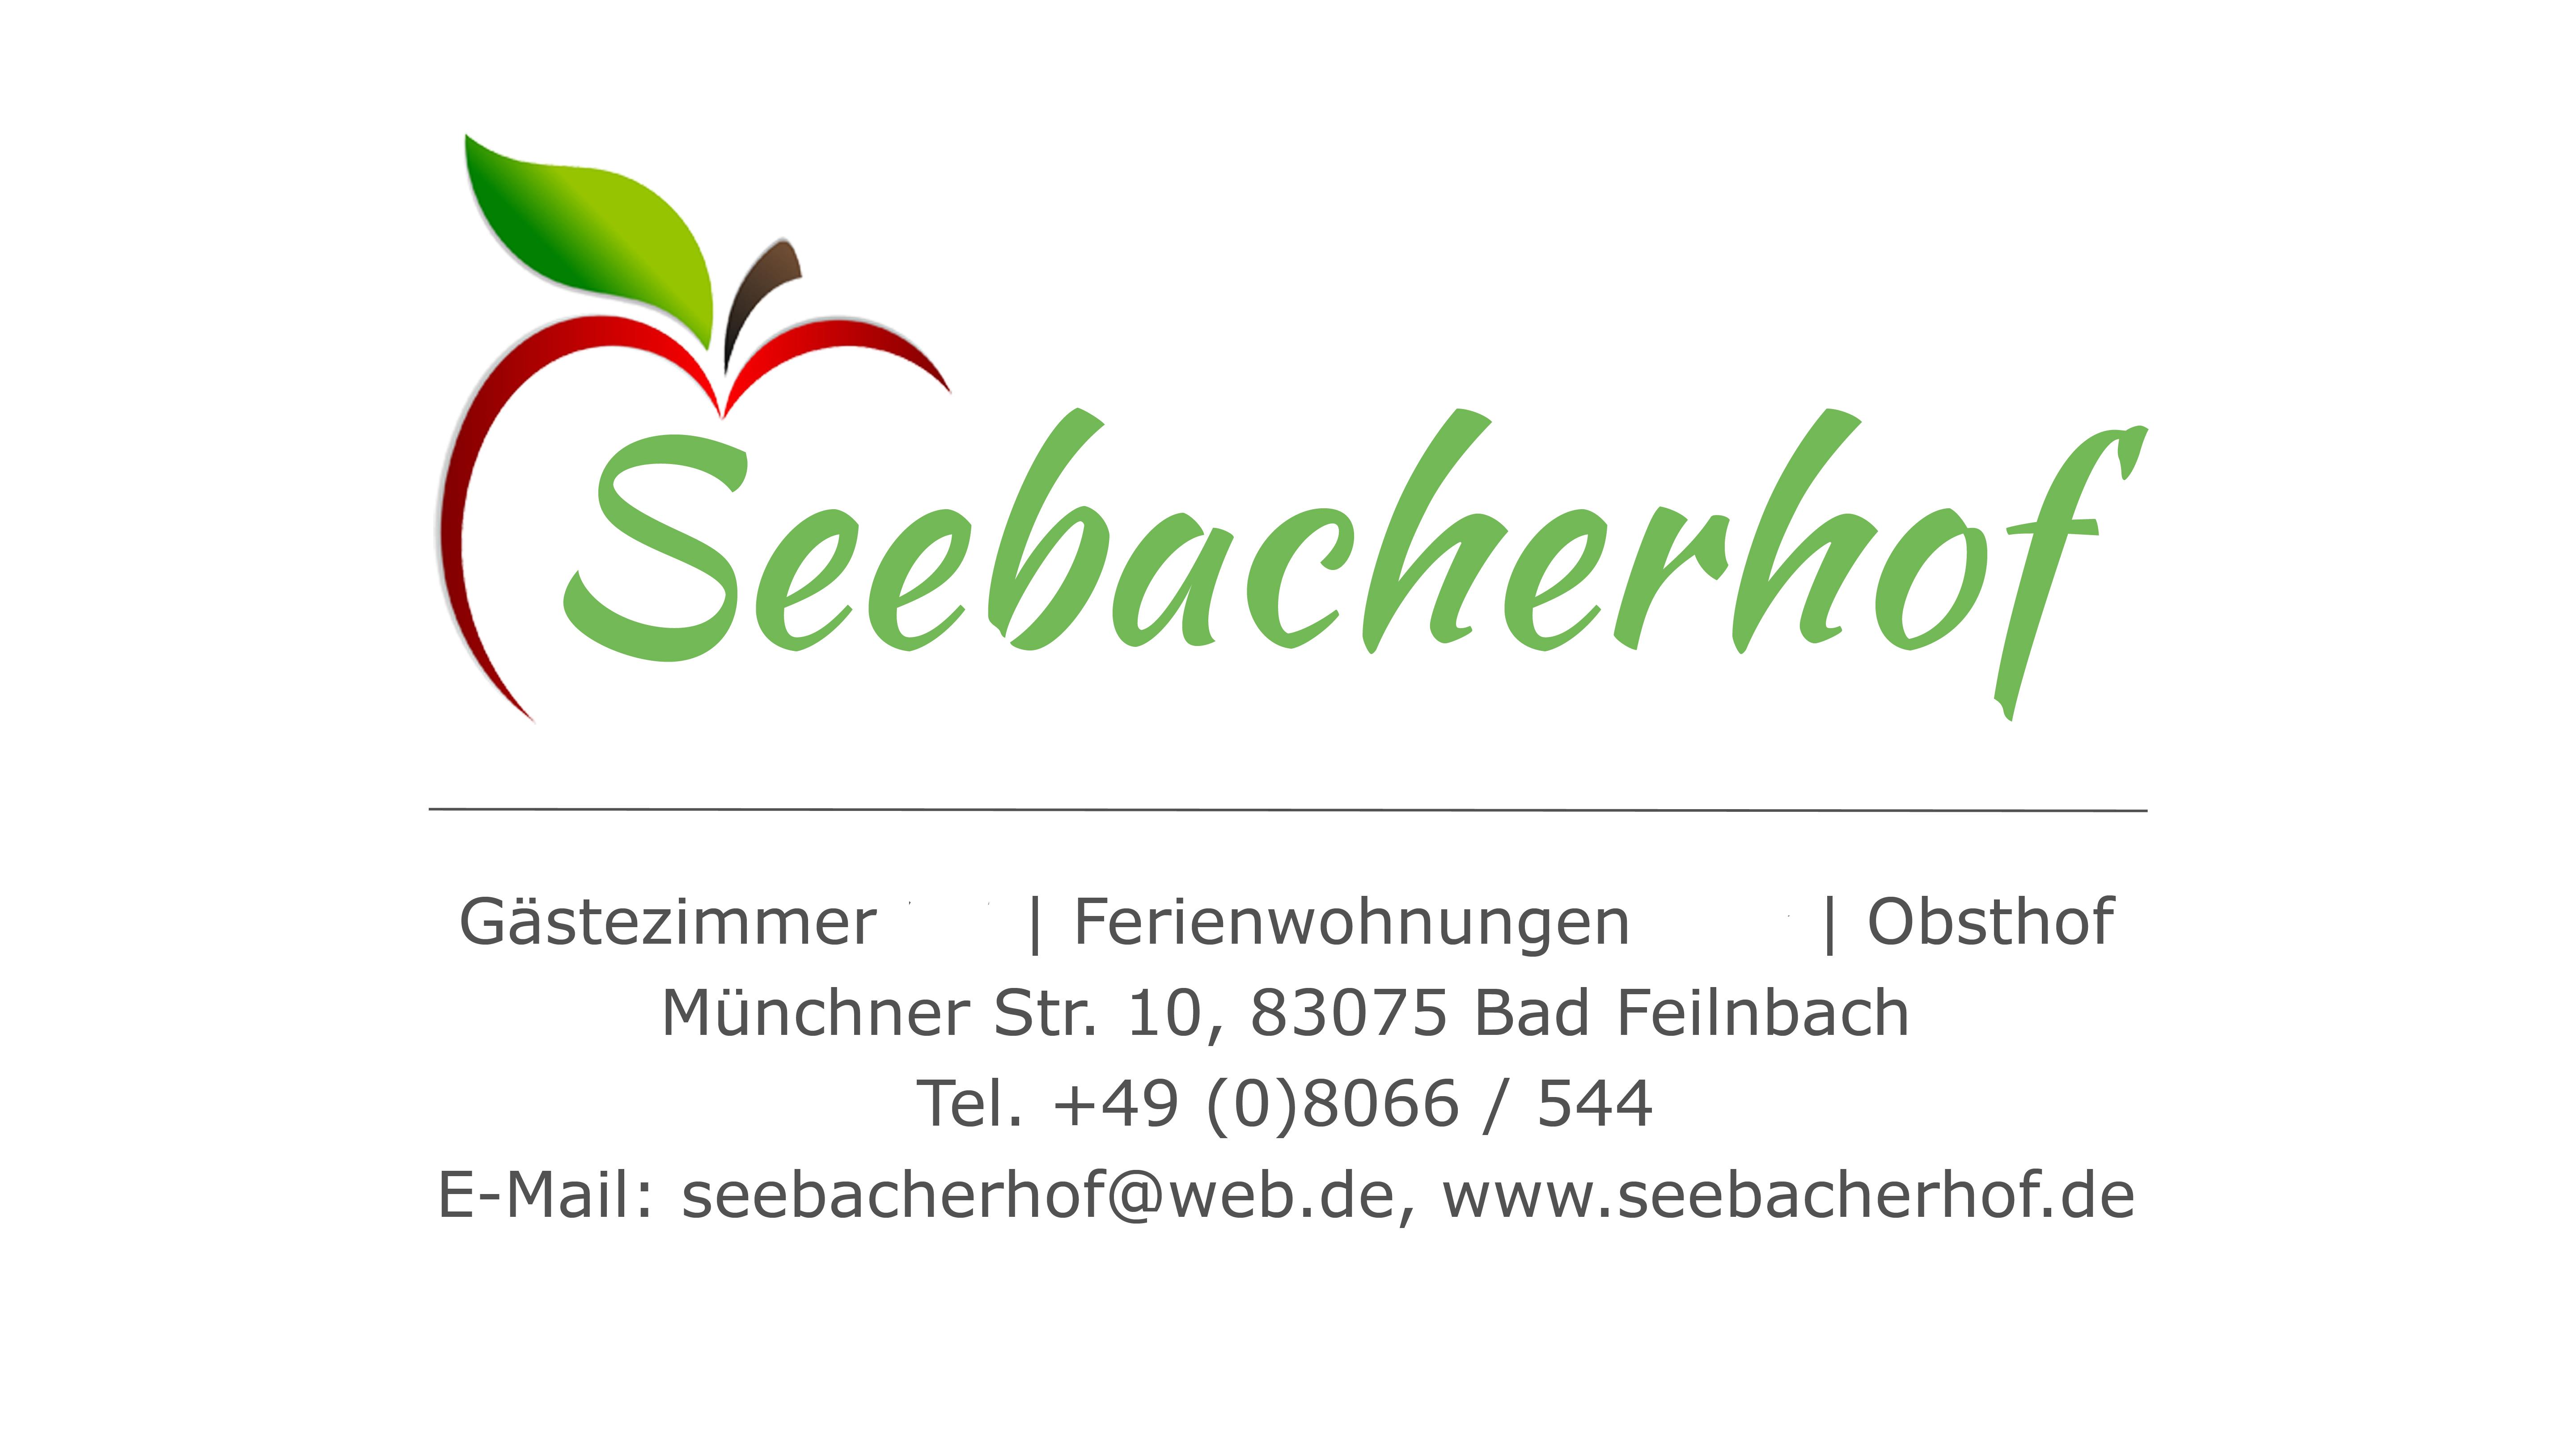 Seebacherhof Bad Feilnbach